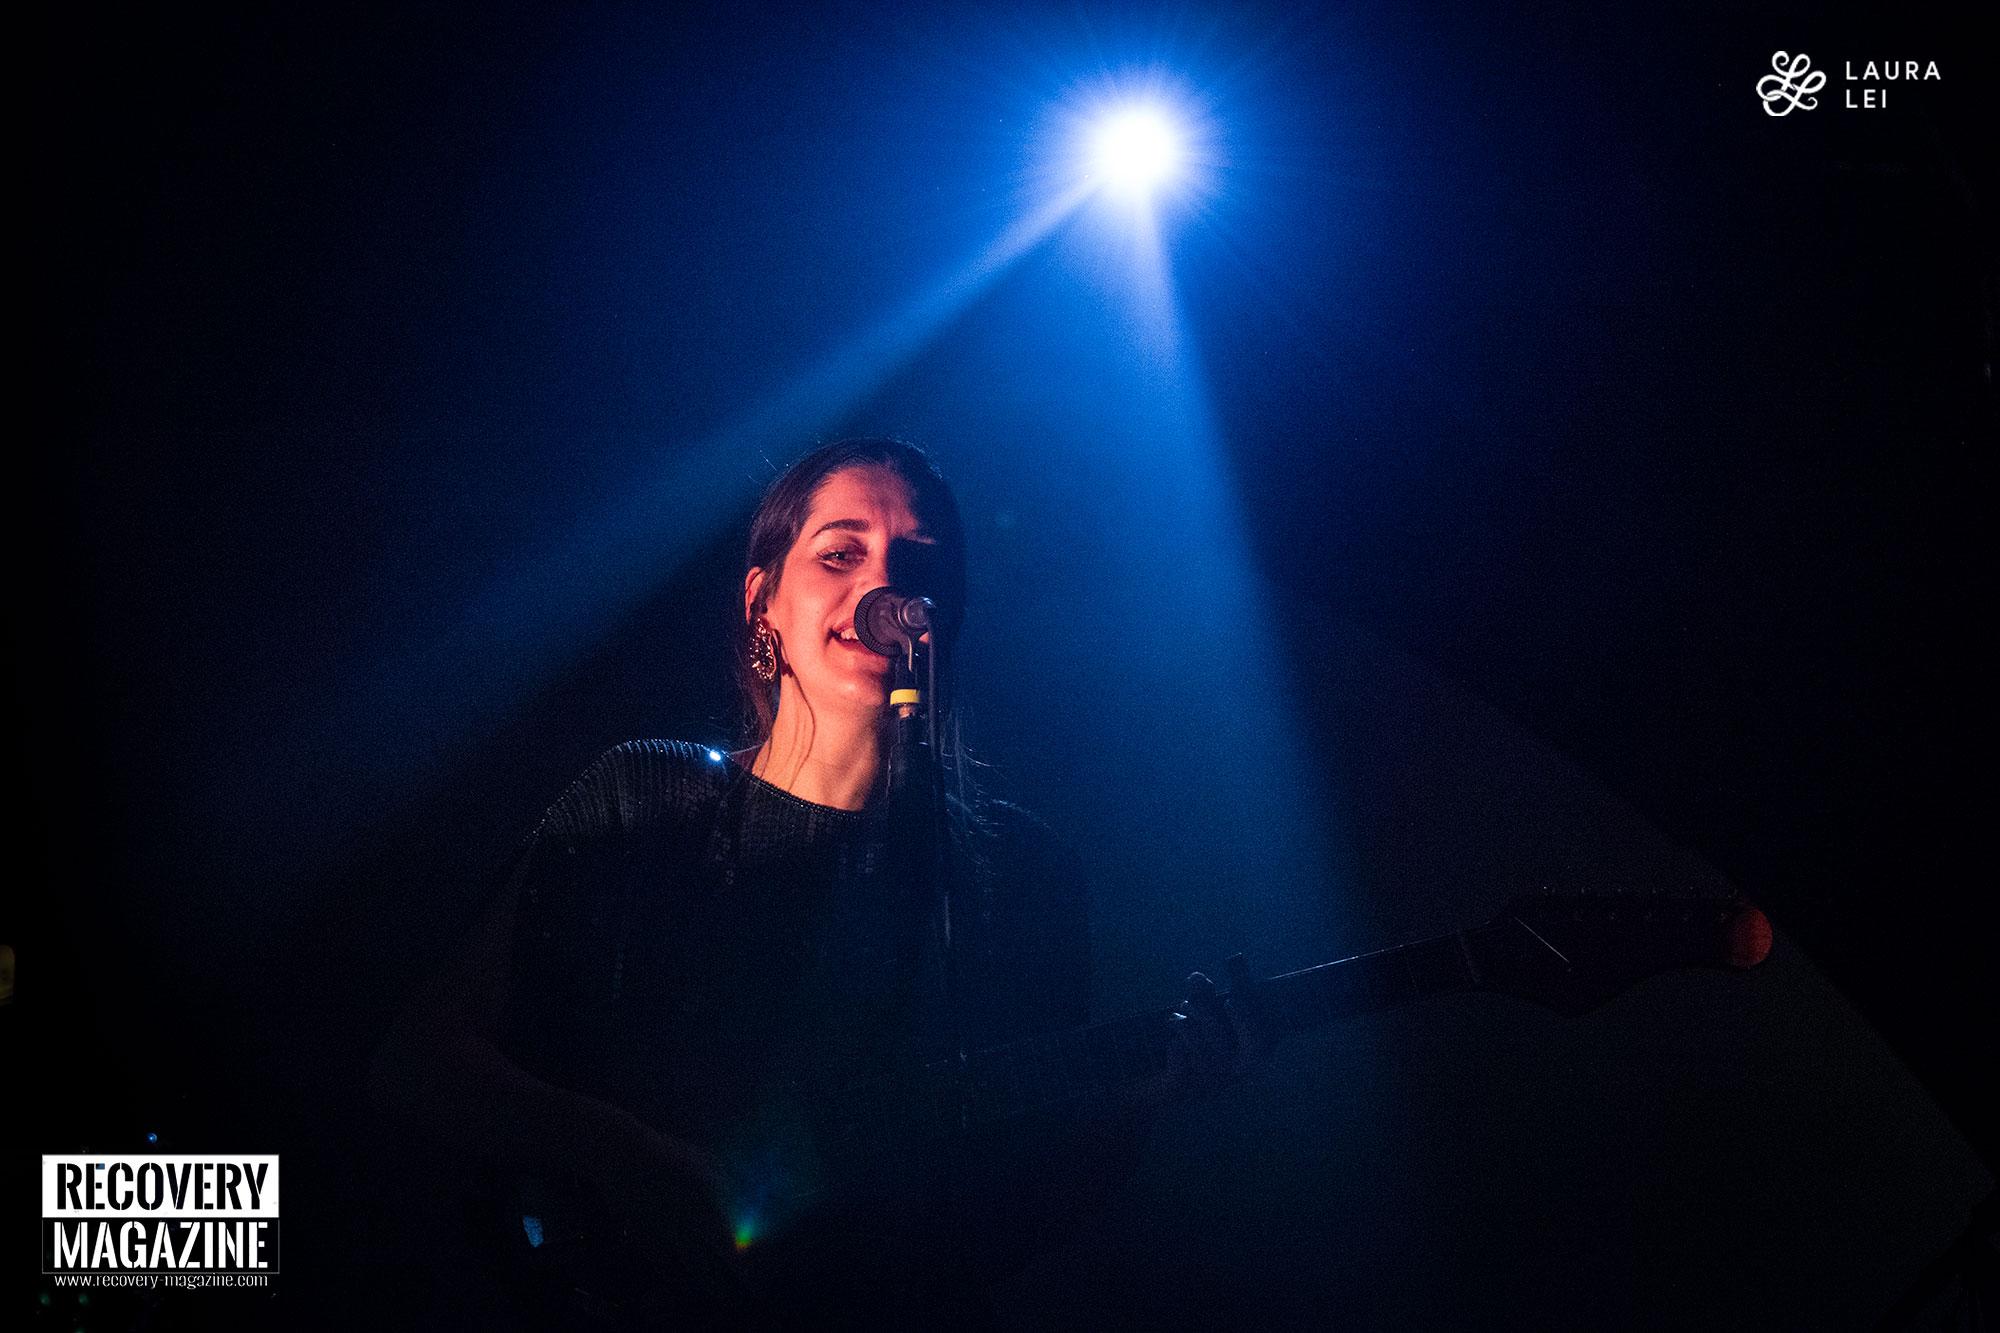 Eefje de Visser smiling during a concert in Bologna, Italy